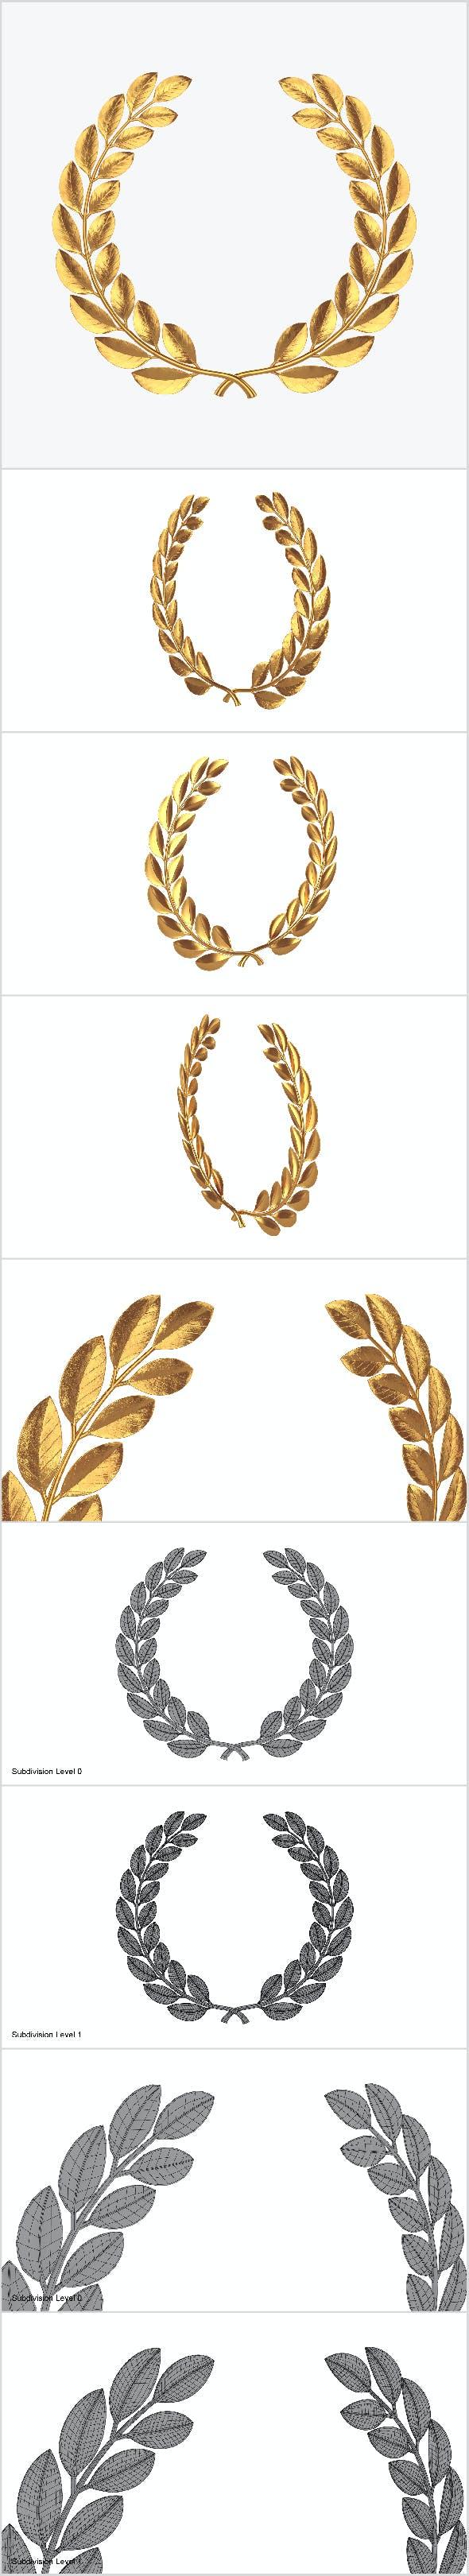 Gold laurel wreath - 3DOcean Item for Sale